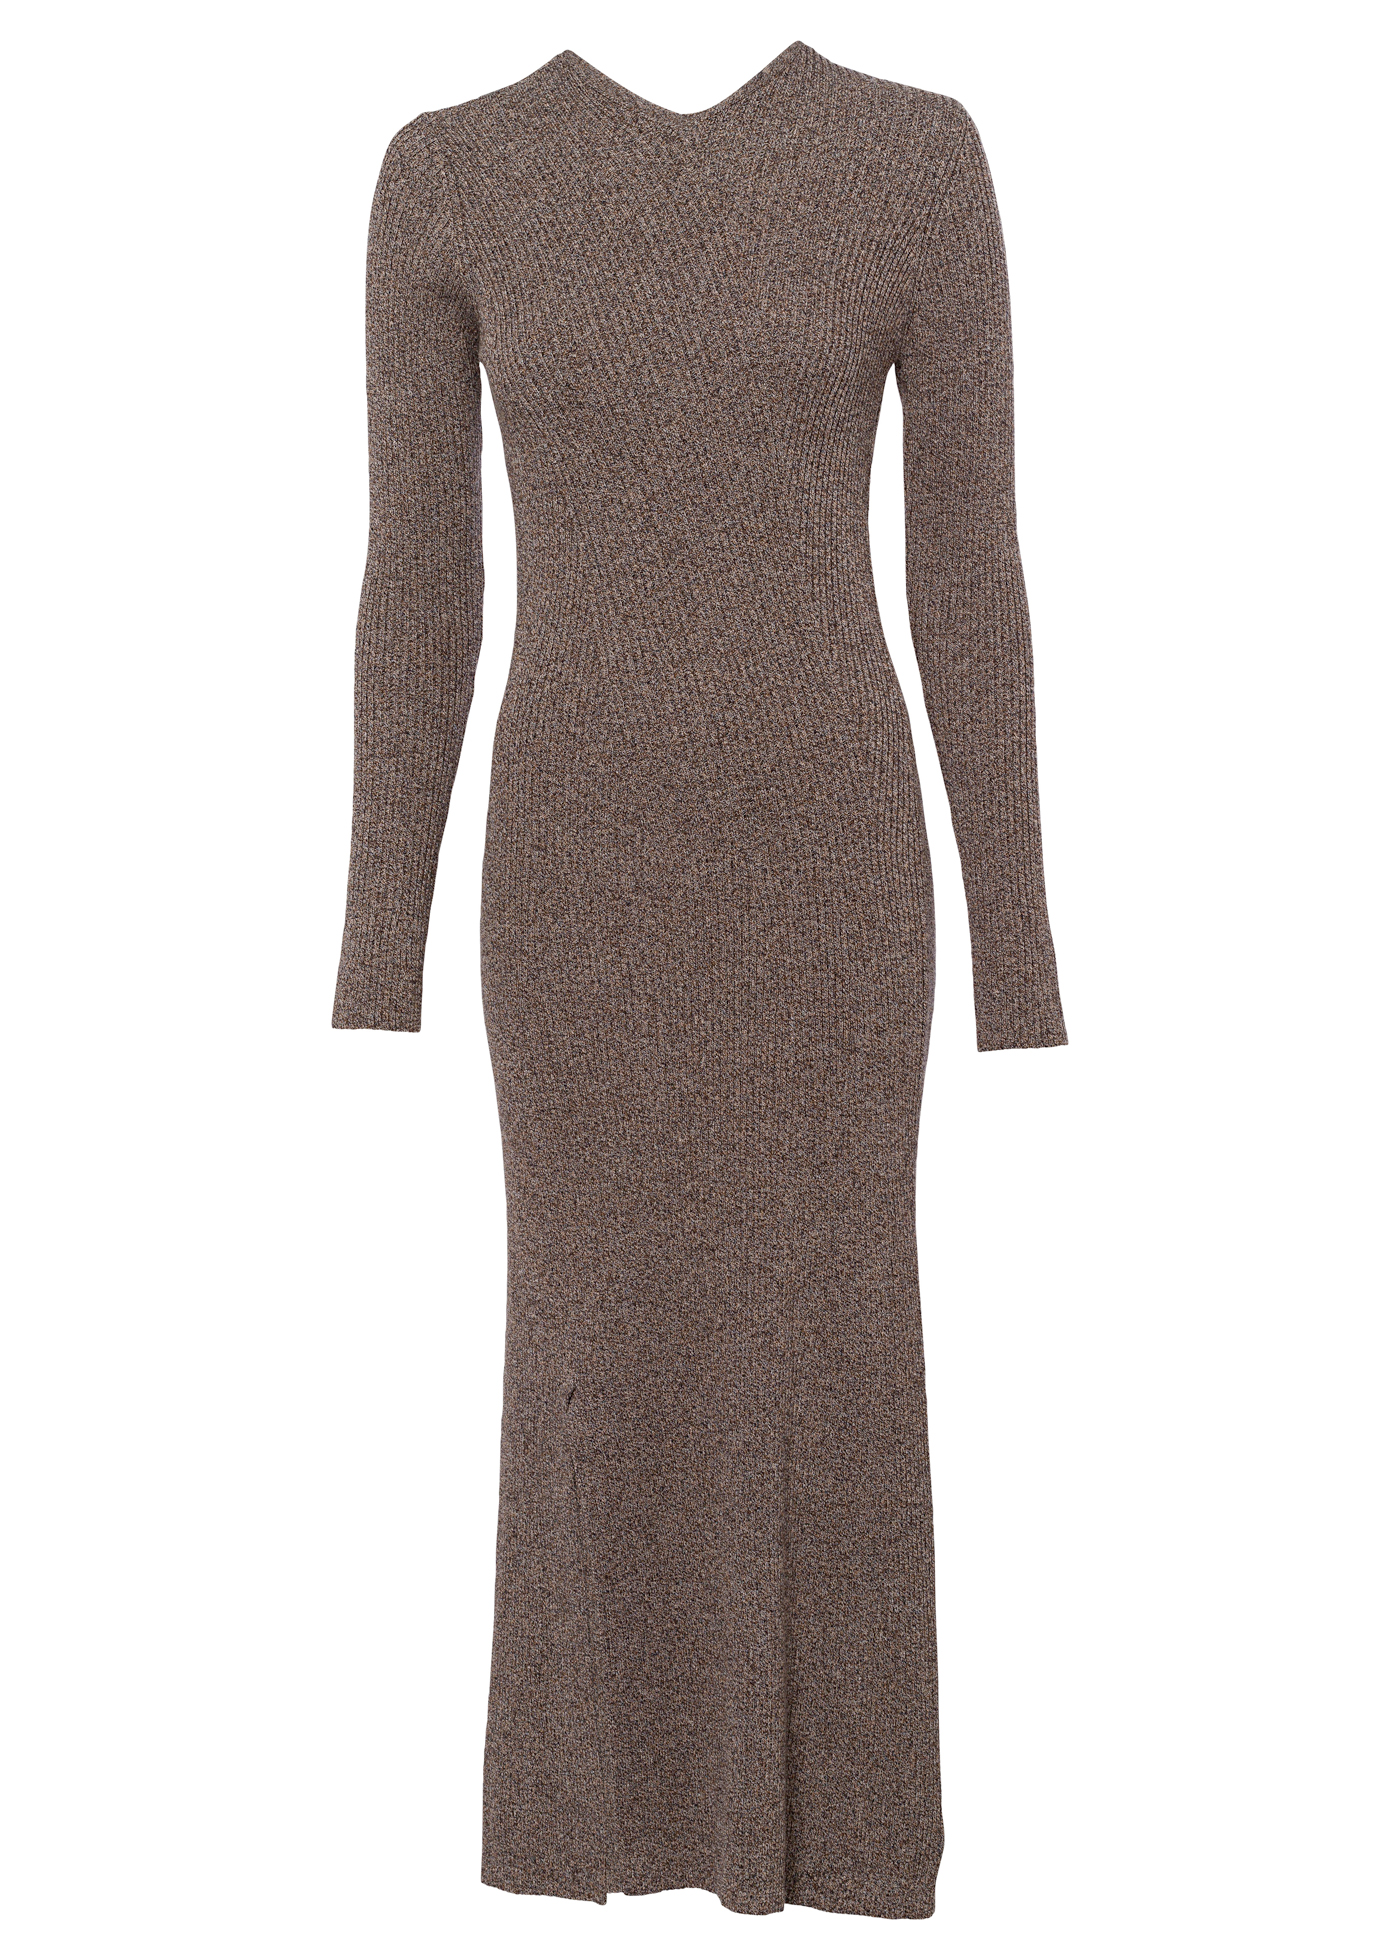 SEGOVIA Dress image number 0